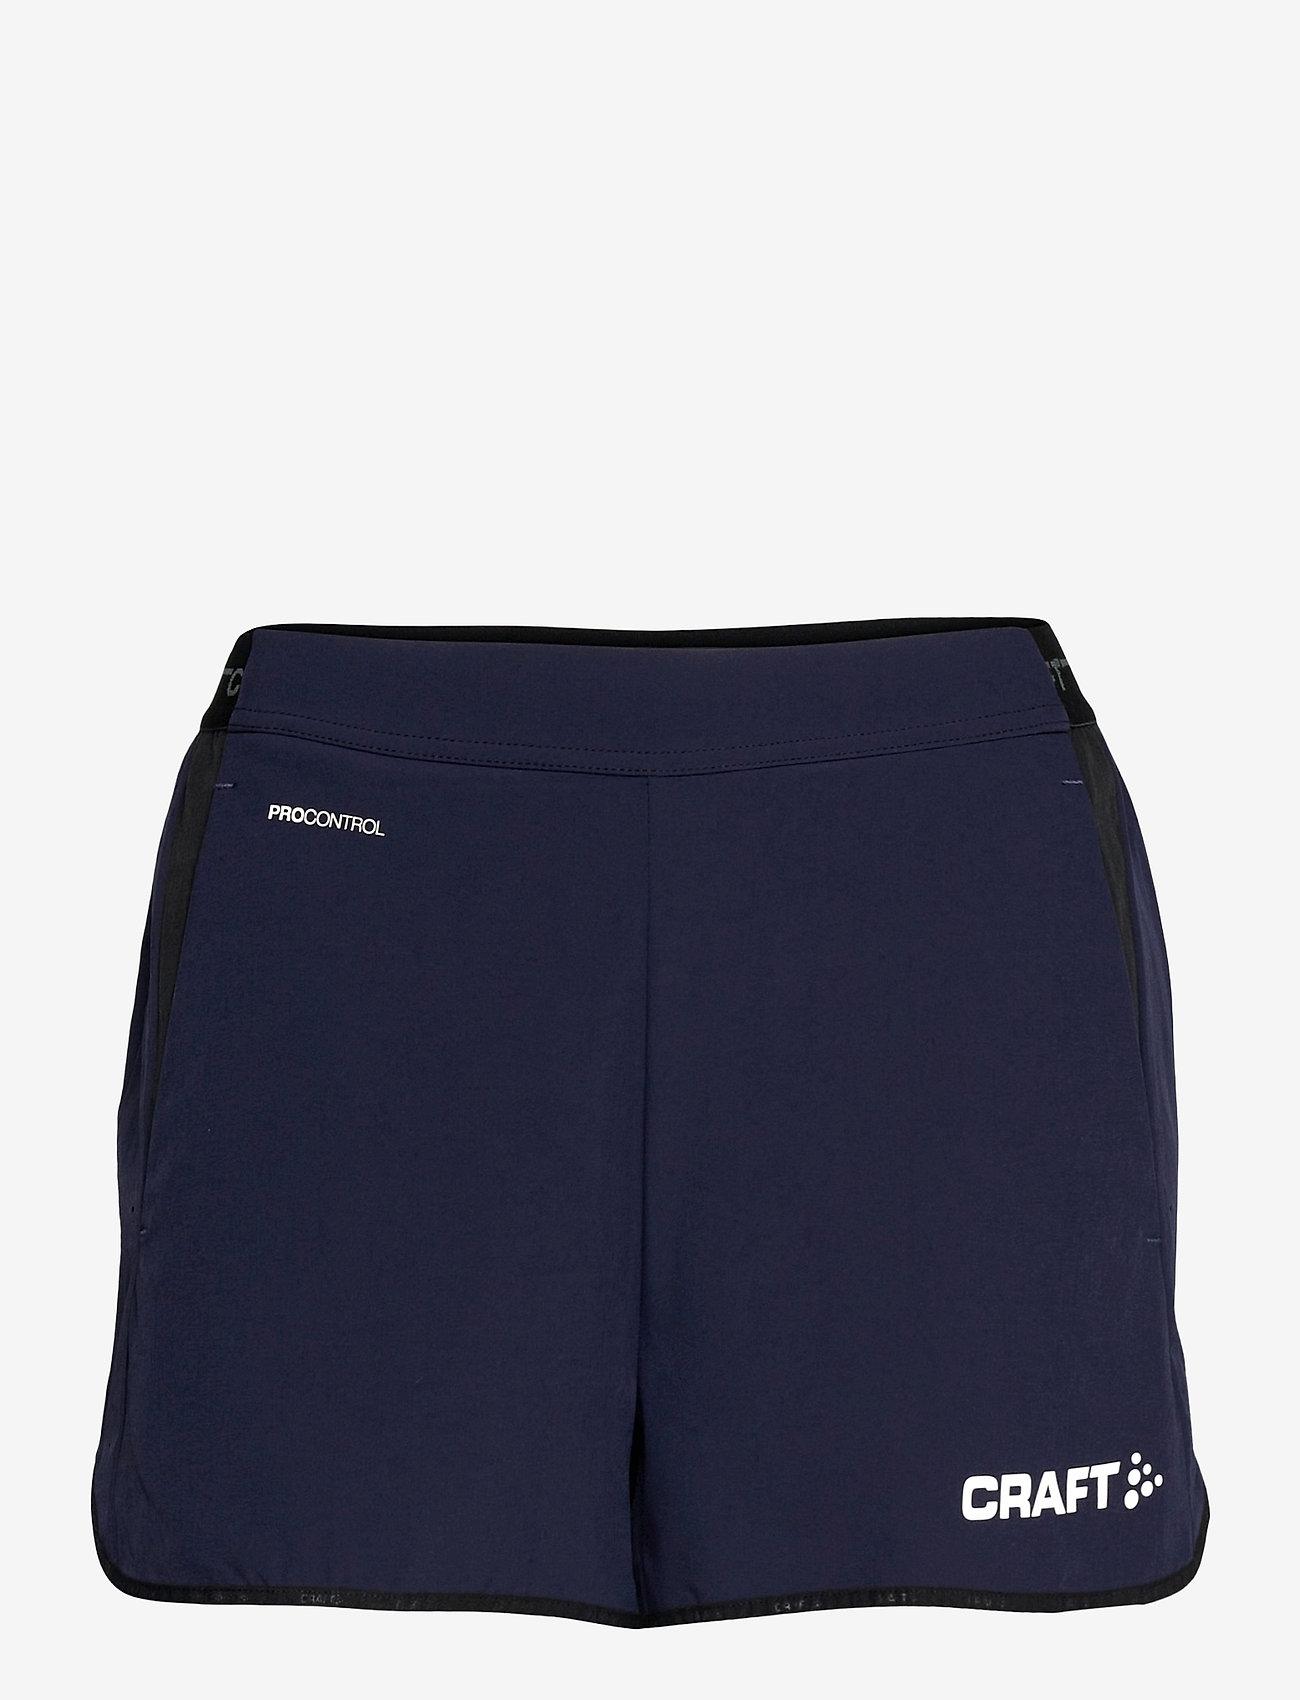 Craft - Pro Control Impact Shorts W - training korte broek - navy/white - 0